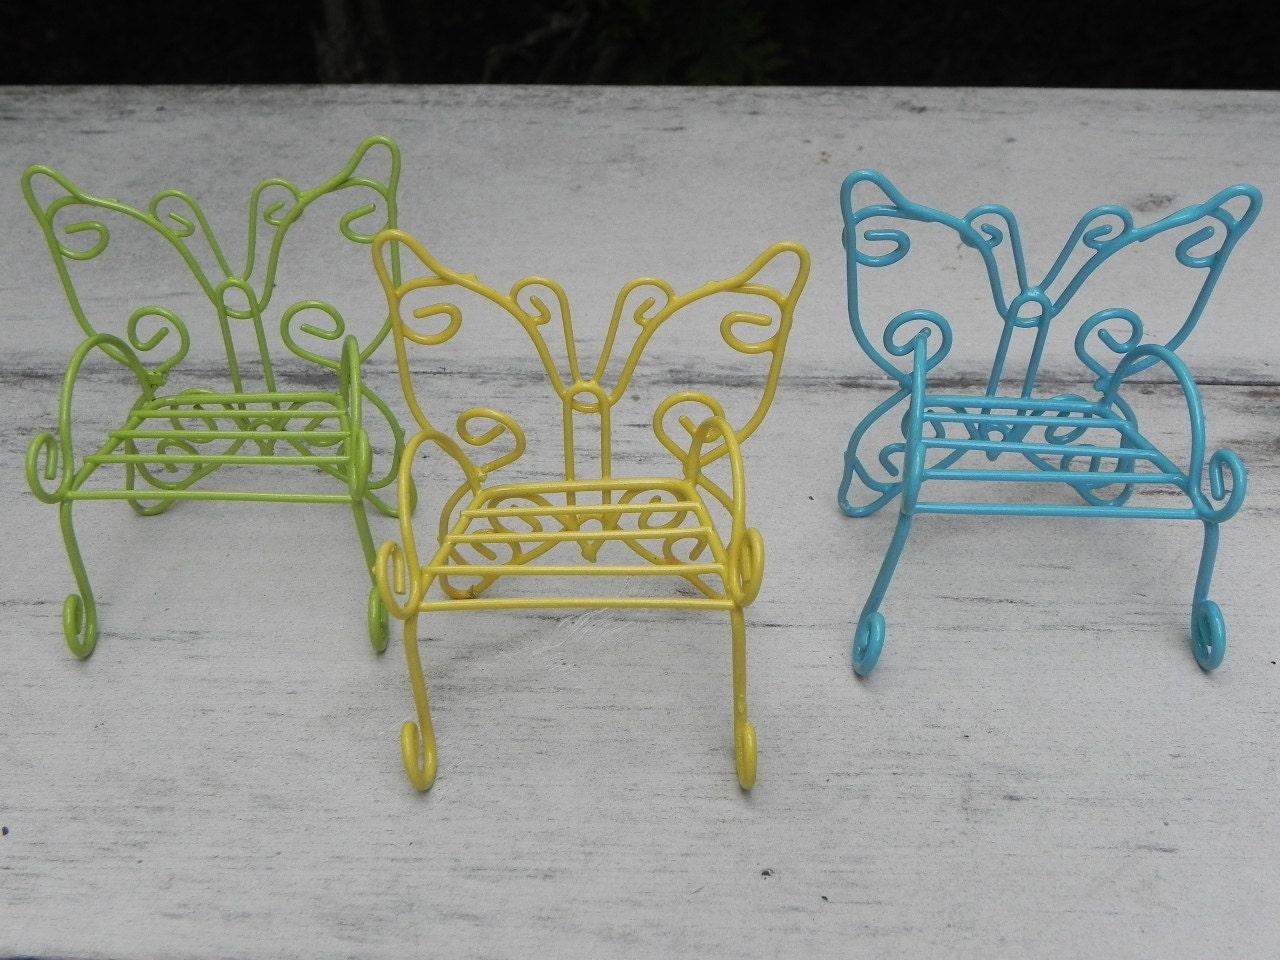 Garden Furniture And Accessories fairy garden furniture one butterfly chair miniature wire